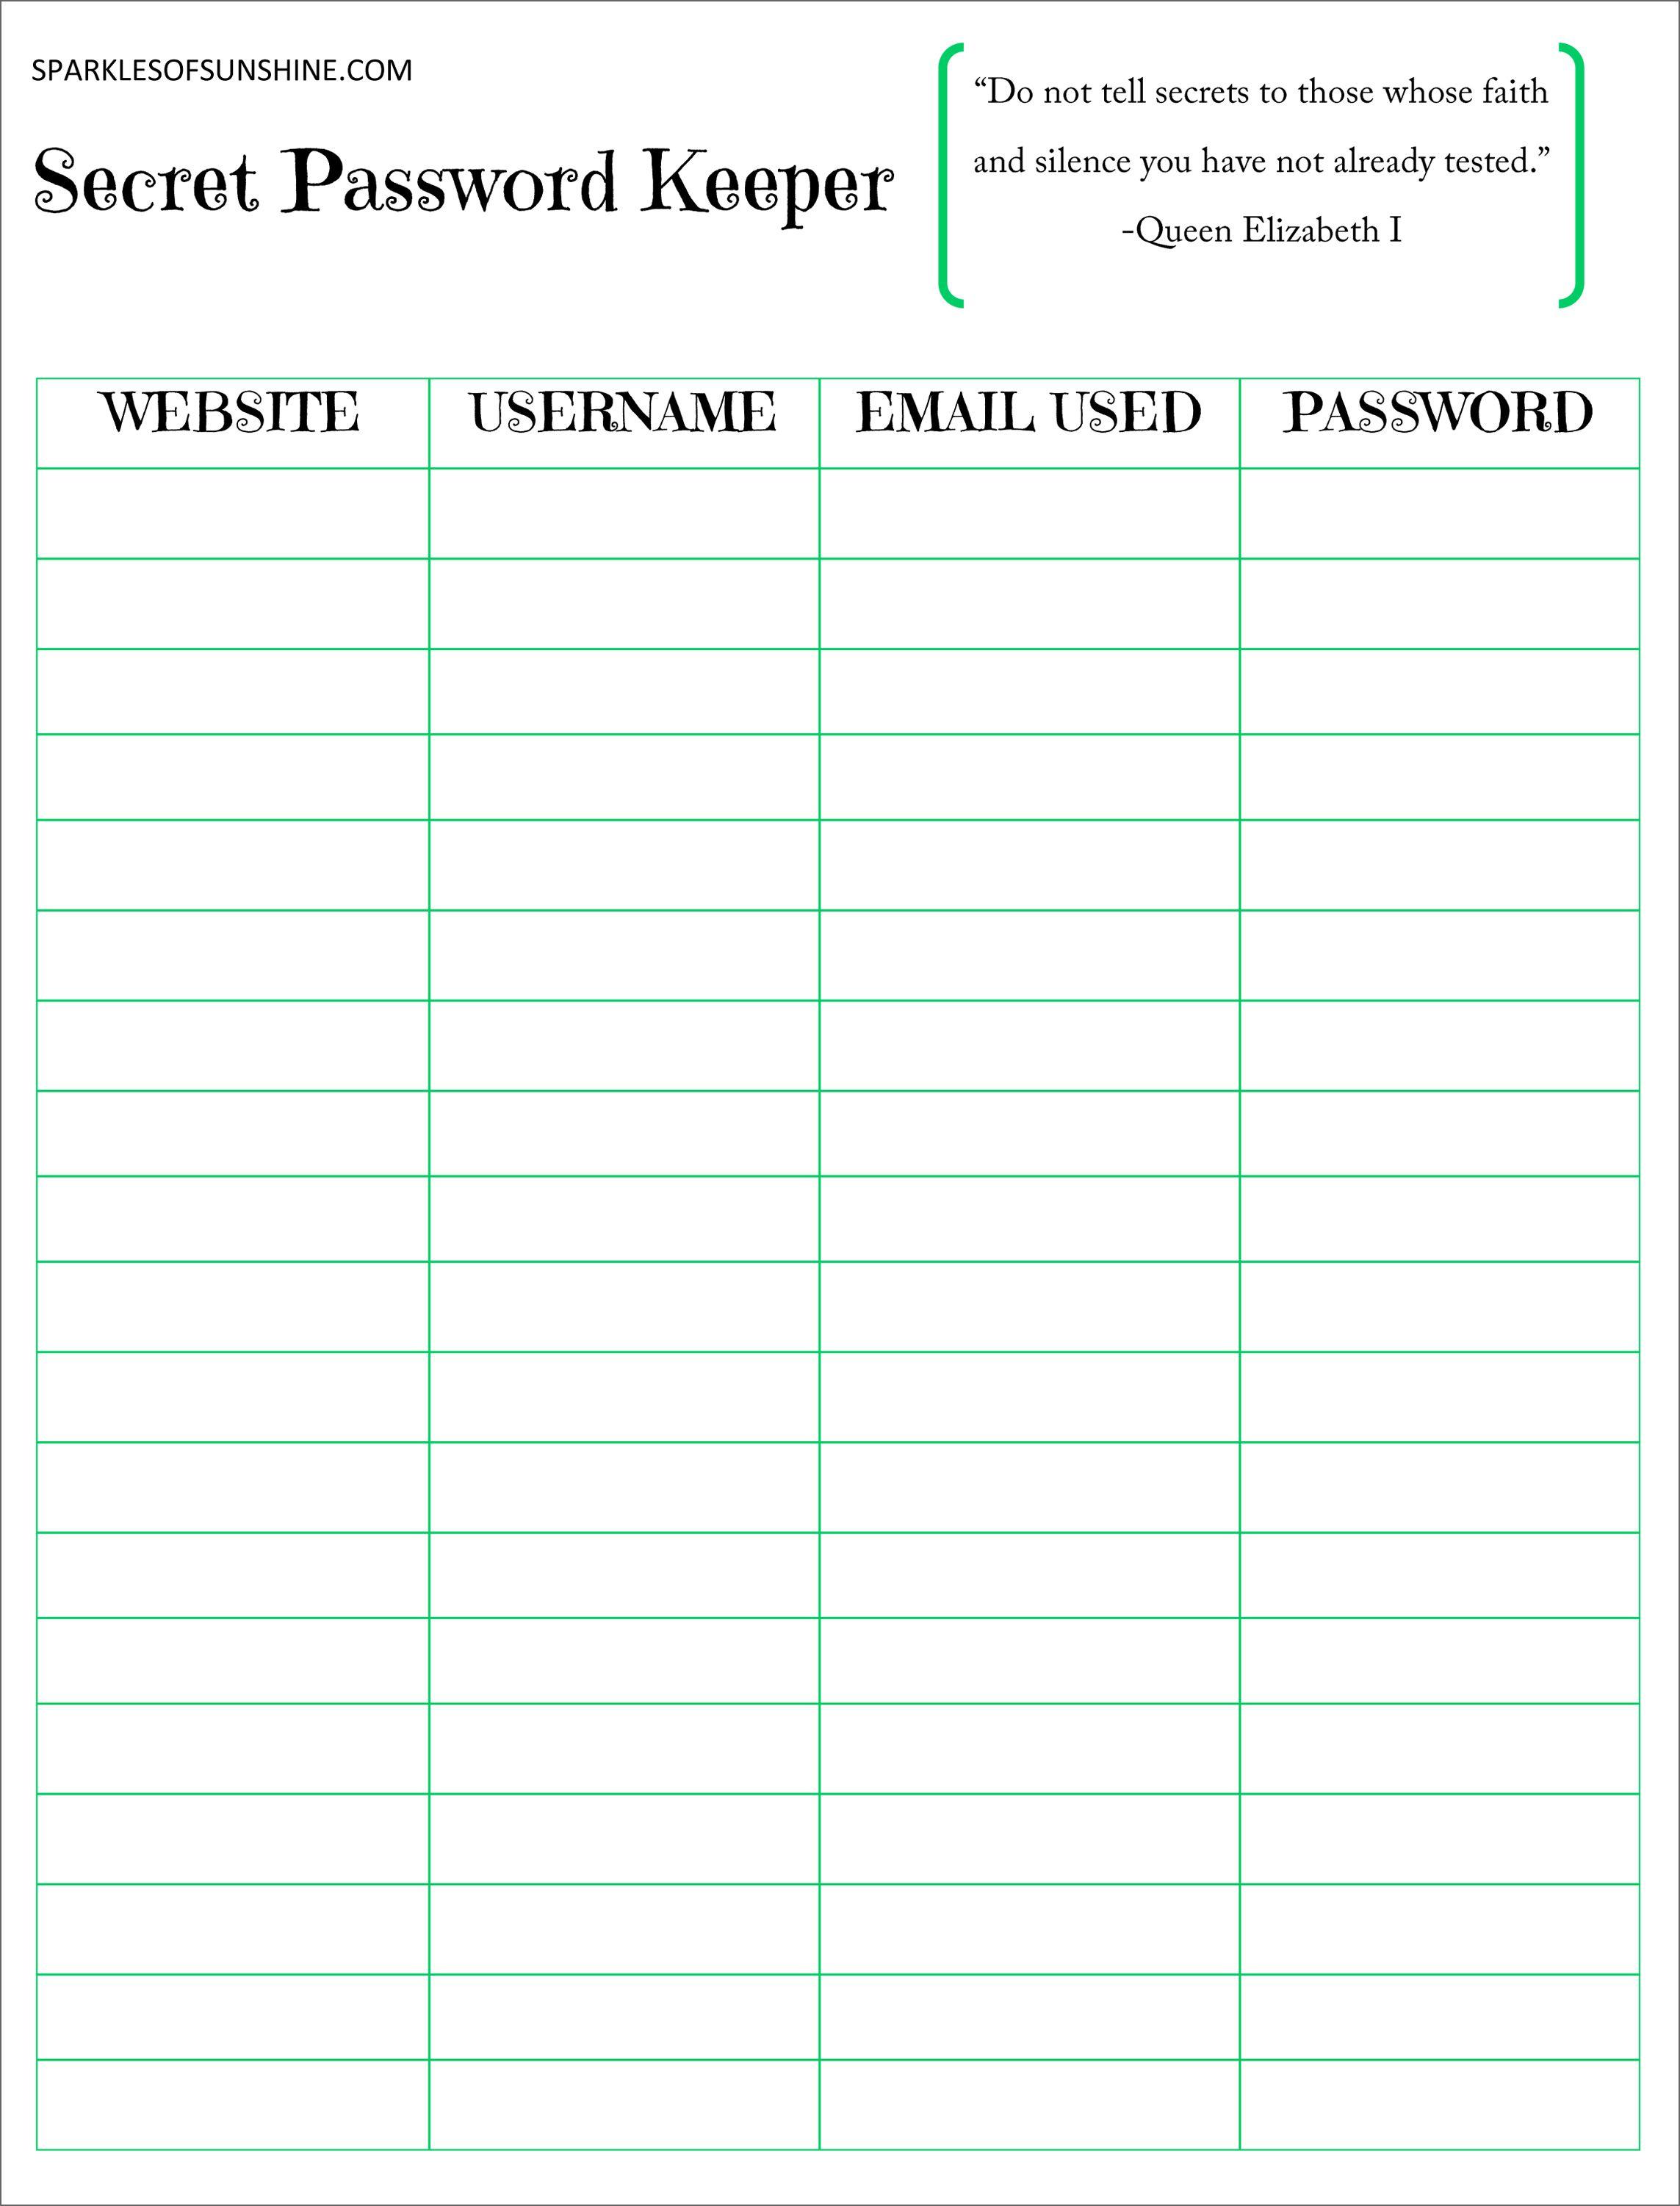 Secret Password Keeper Free Printable | Planners | Password Keeper - Free Printable Password Keeper